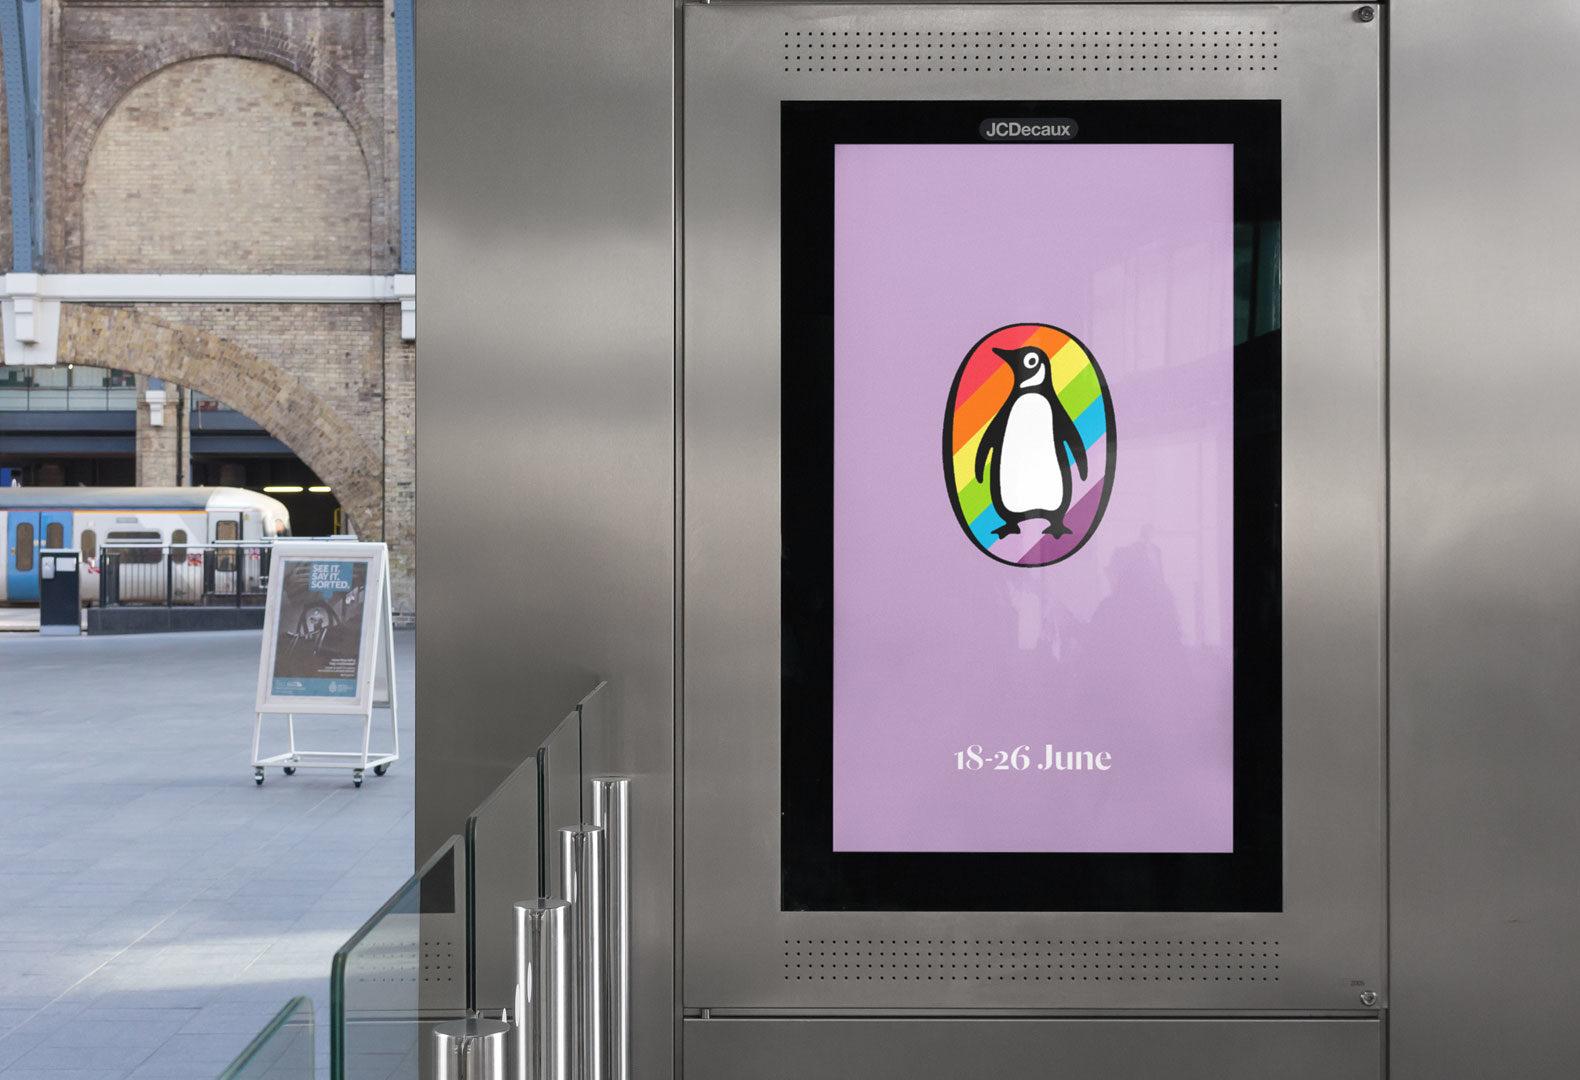 Digital advertising billboard for Penguin Pride.